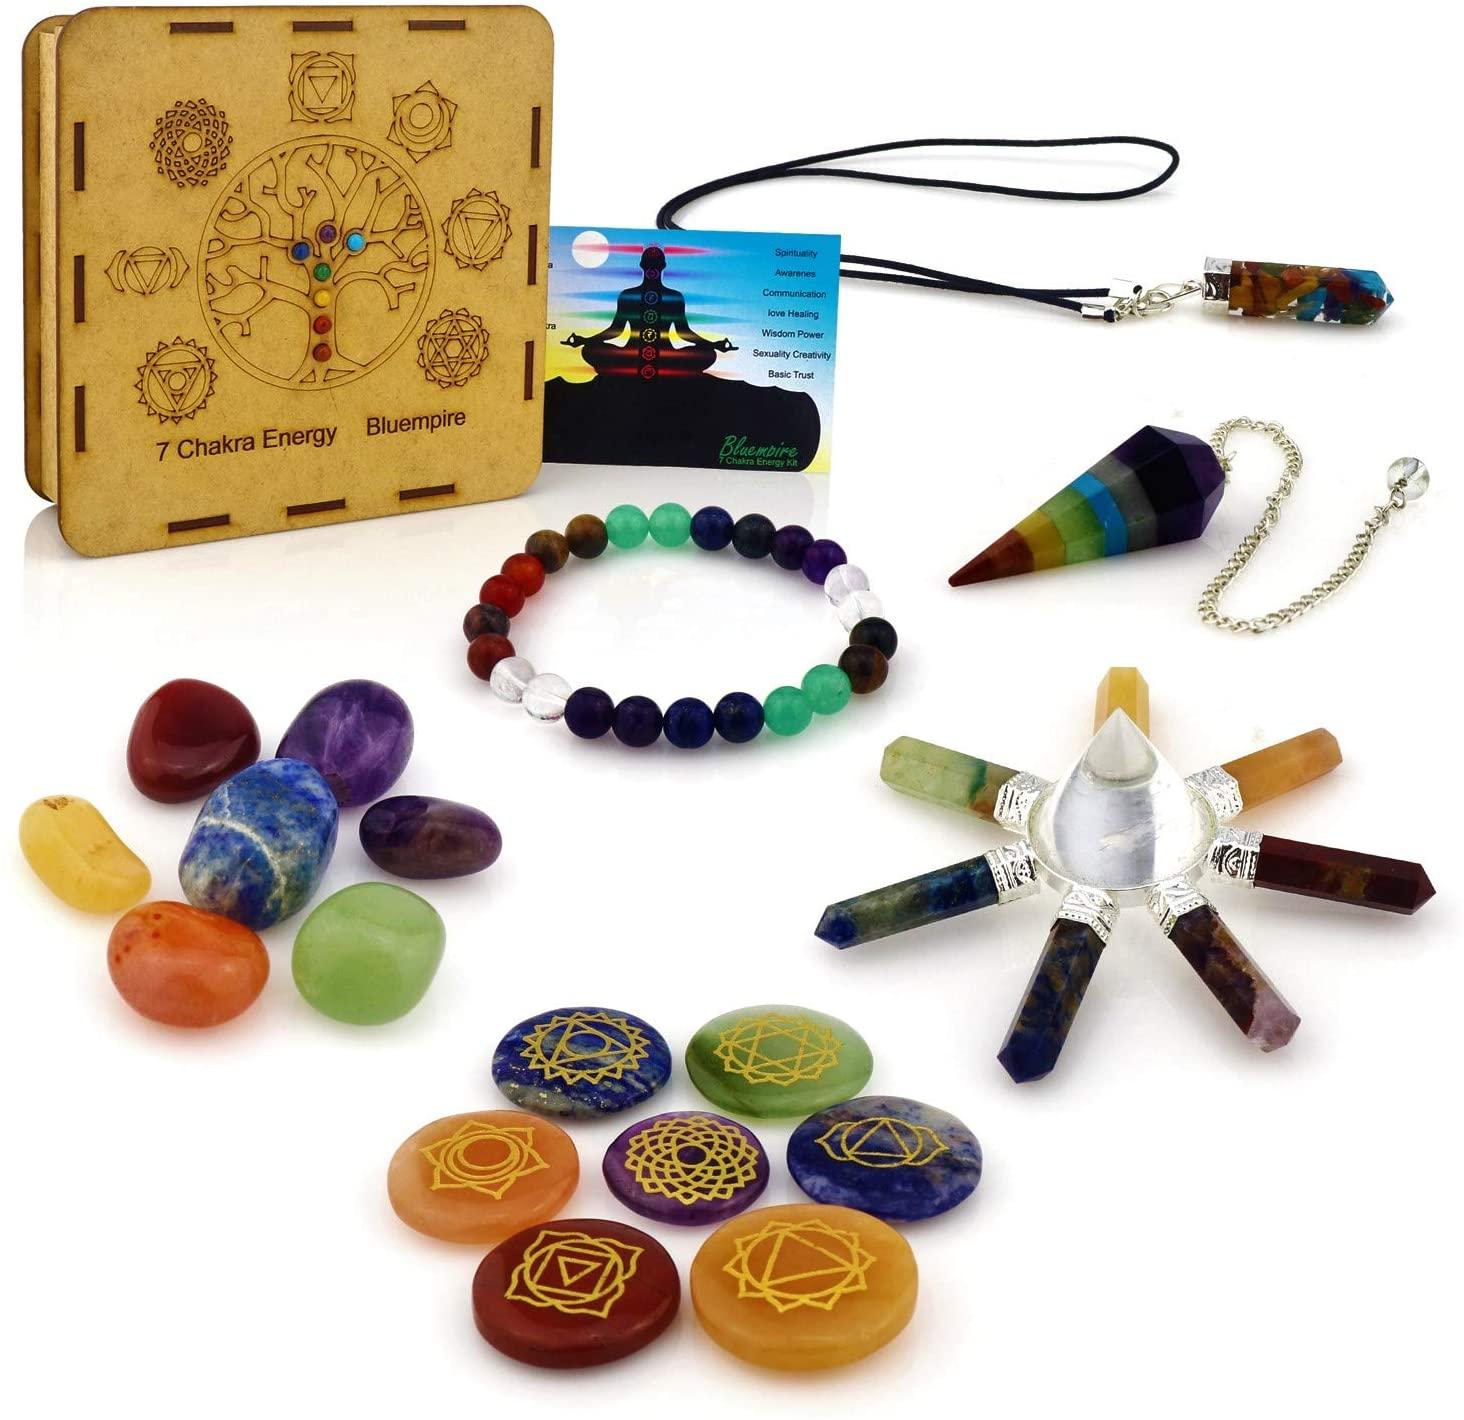 Chakra Stones Set - Crystals and Healing Stones Kit, 5 Ebooks (18 pcs)